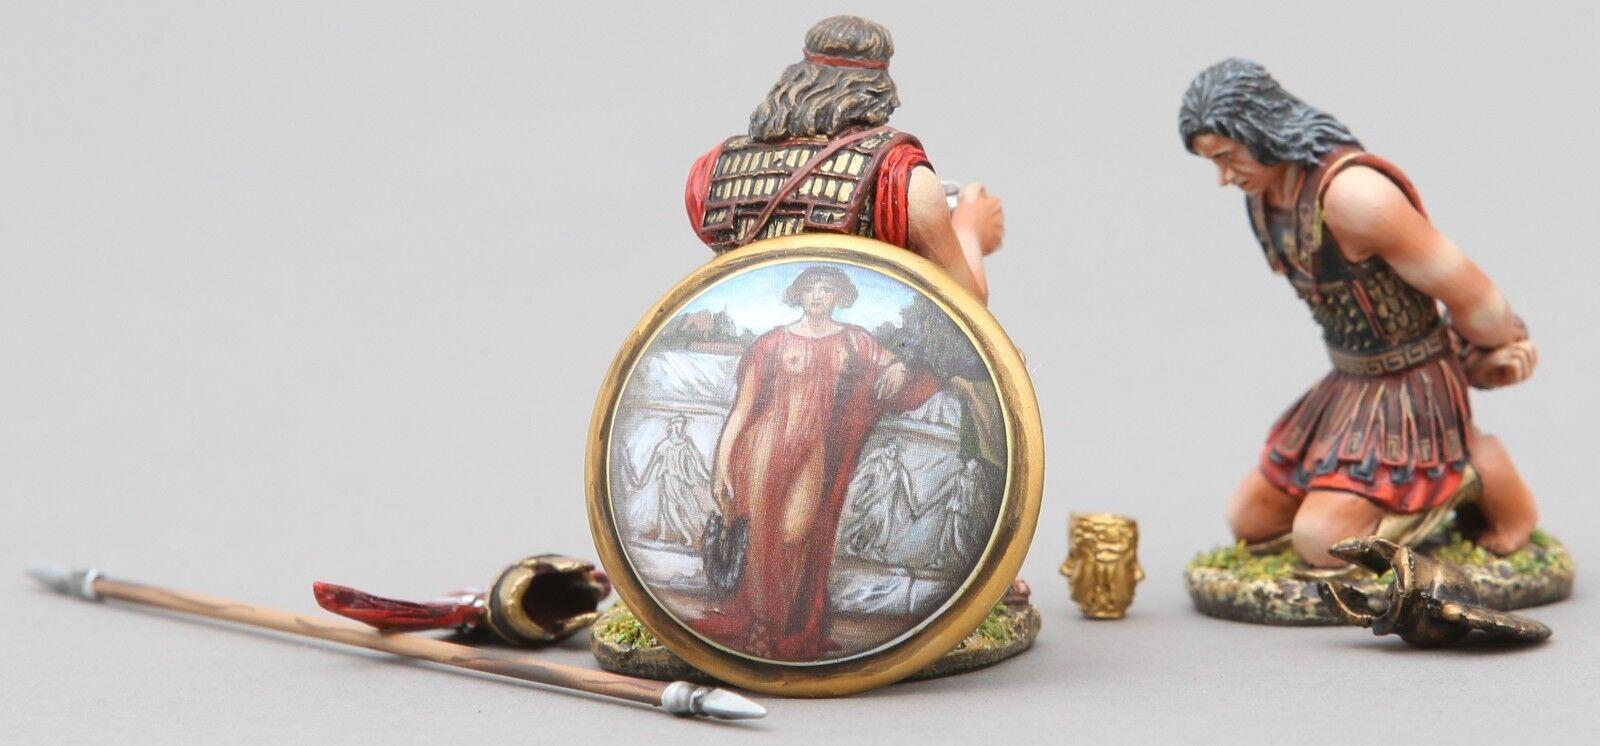 THOMAS GUNN ANTIENT GREKS & PERSIANS SPAN028C SPkonstAN PRISENT MIB